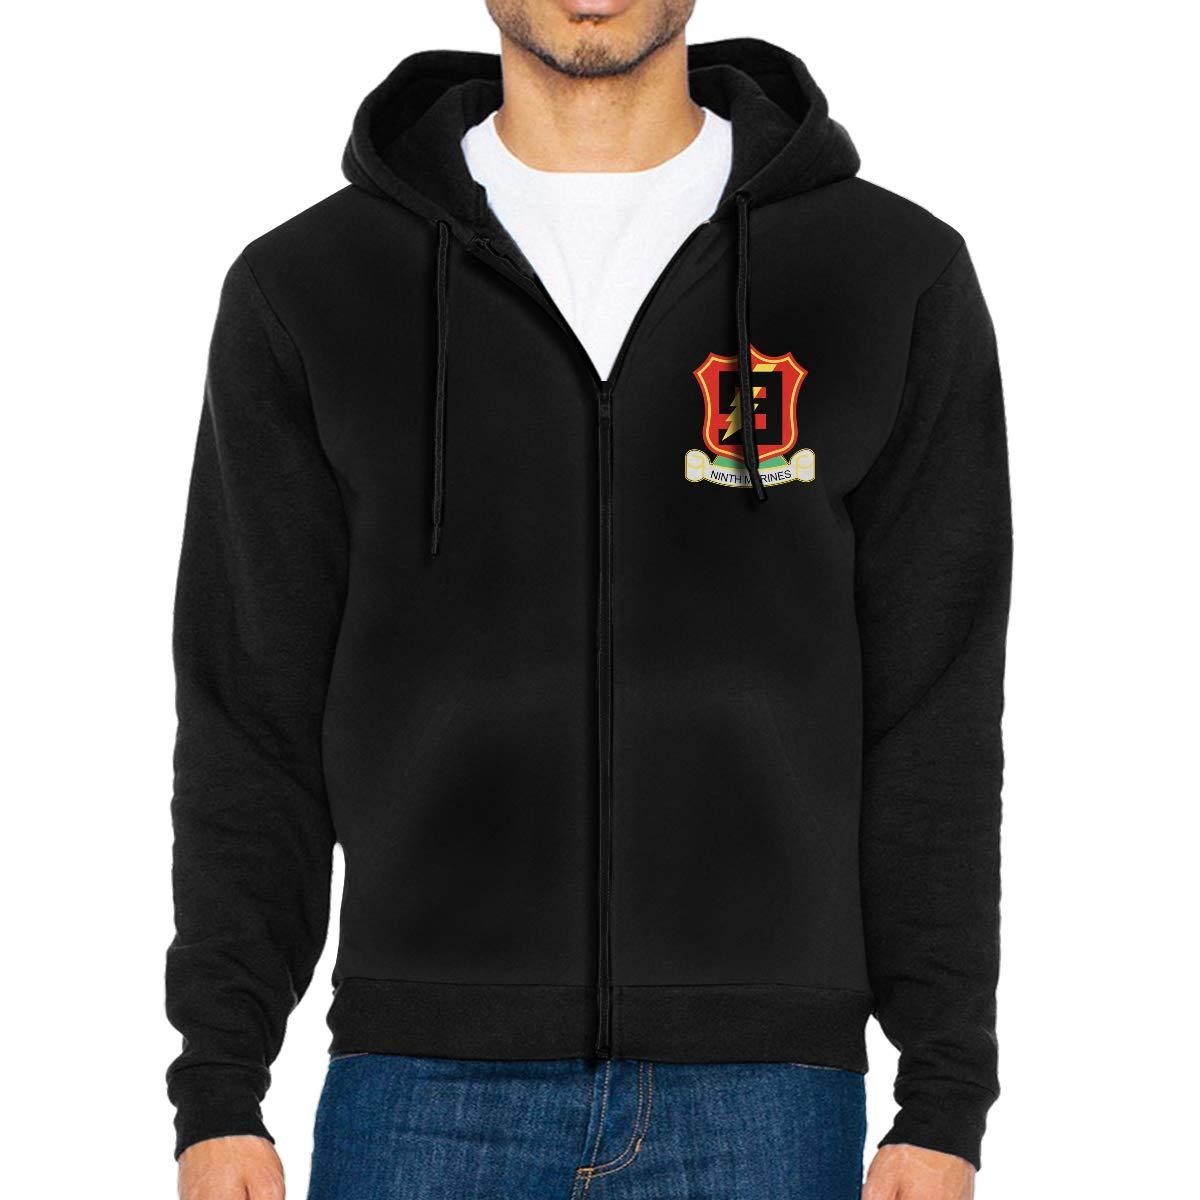 9th Marine Regiment Mens Full-Zip Up Hoodie Jacket Pullover Sweatshirt